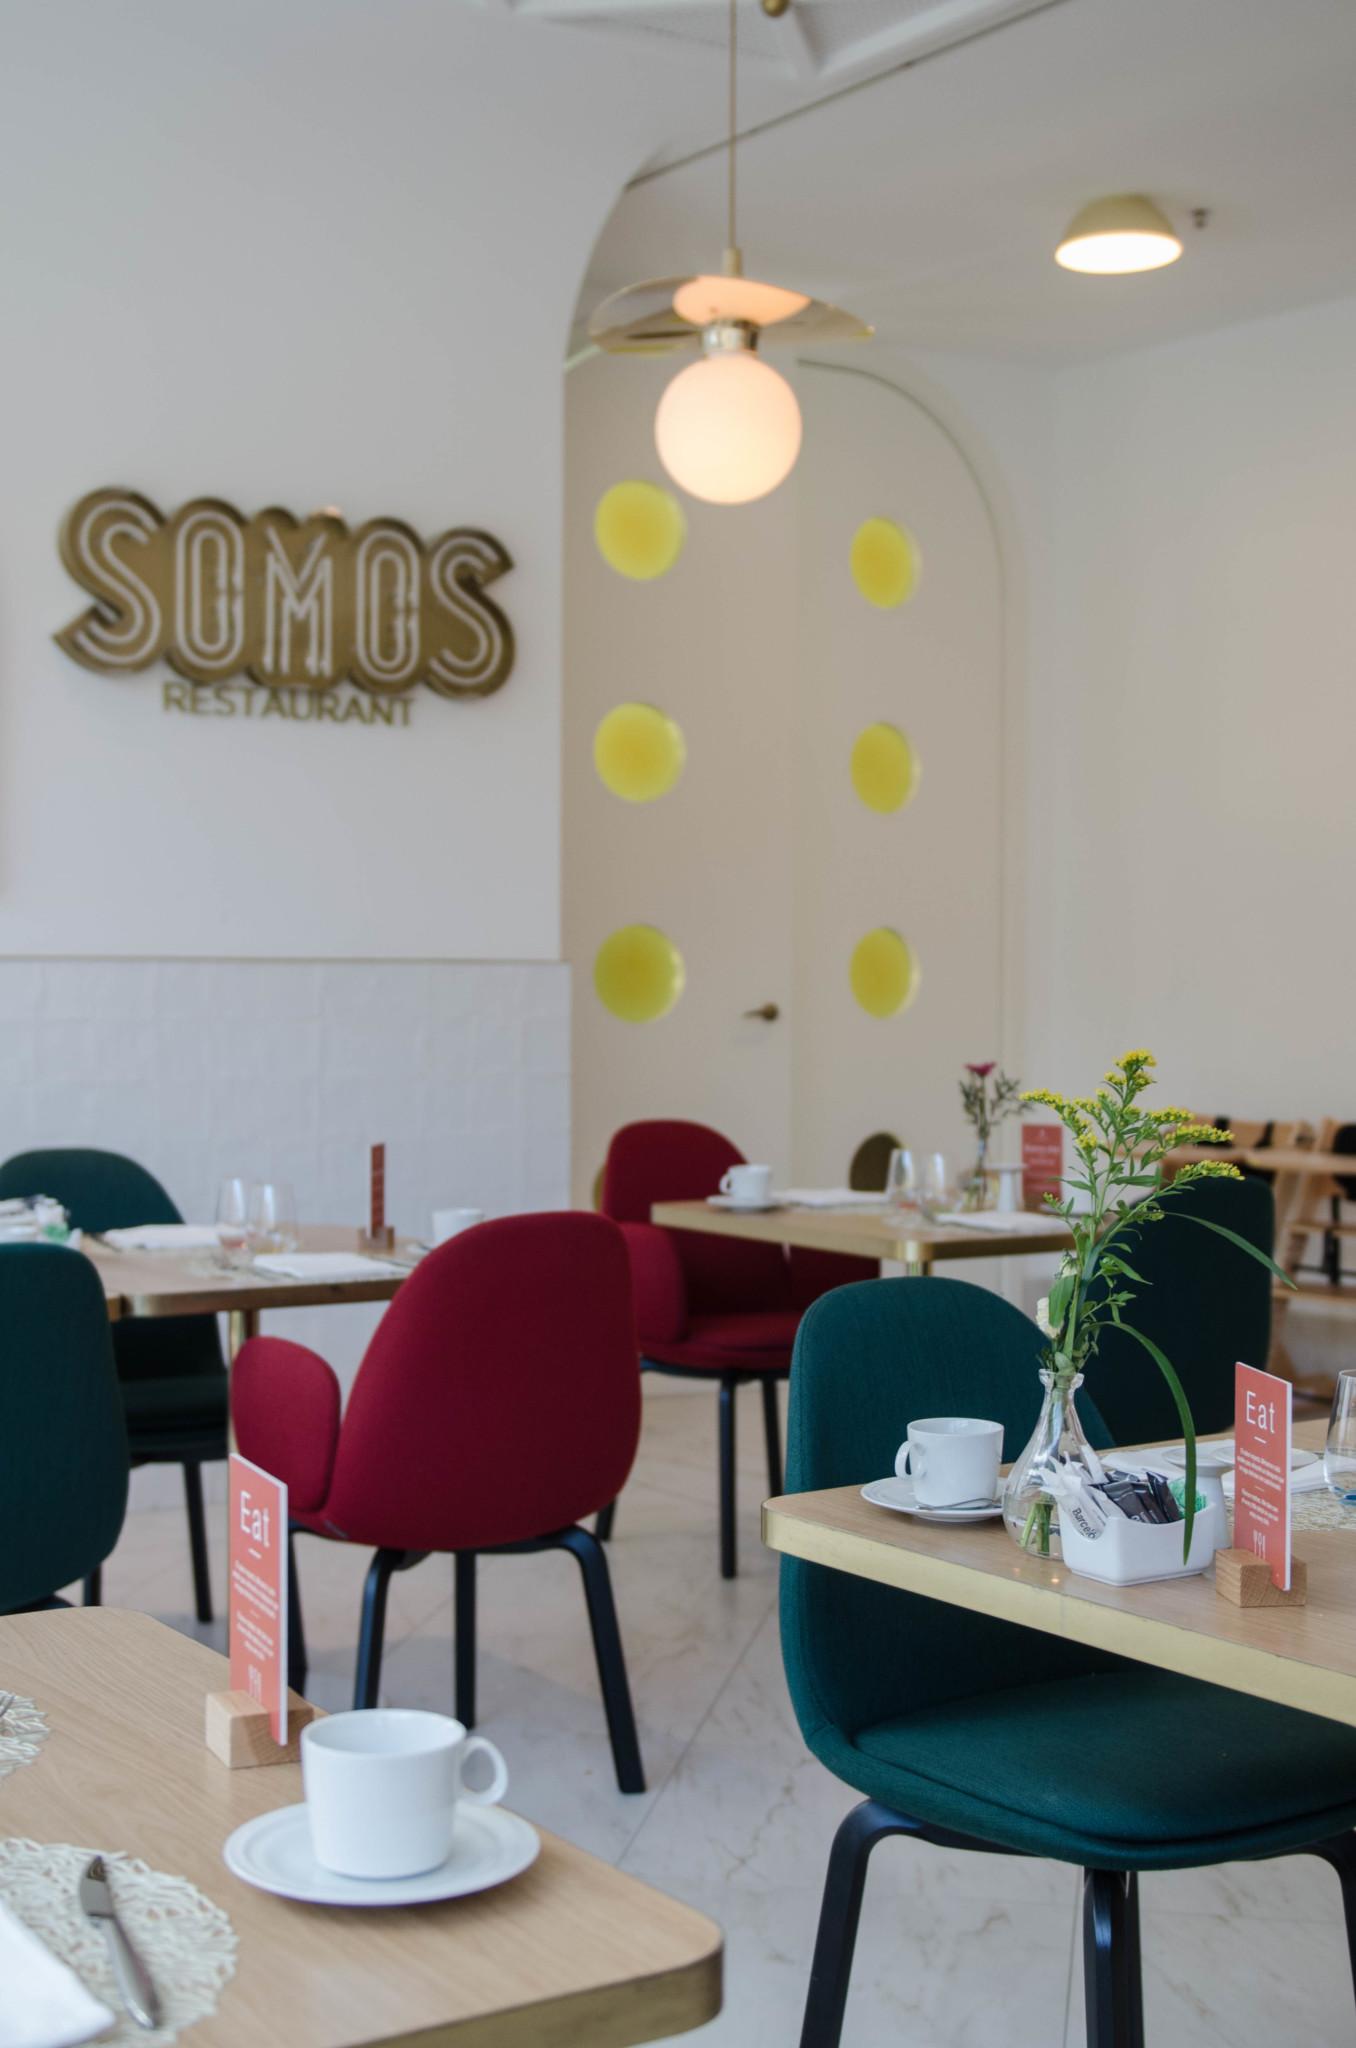 Somos Restaurant Hotel Barcelo Madrid